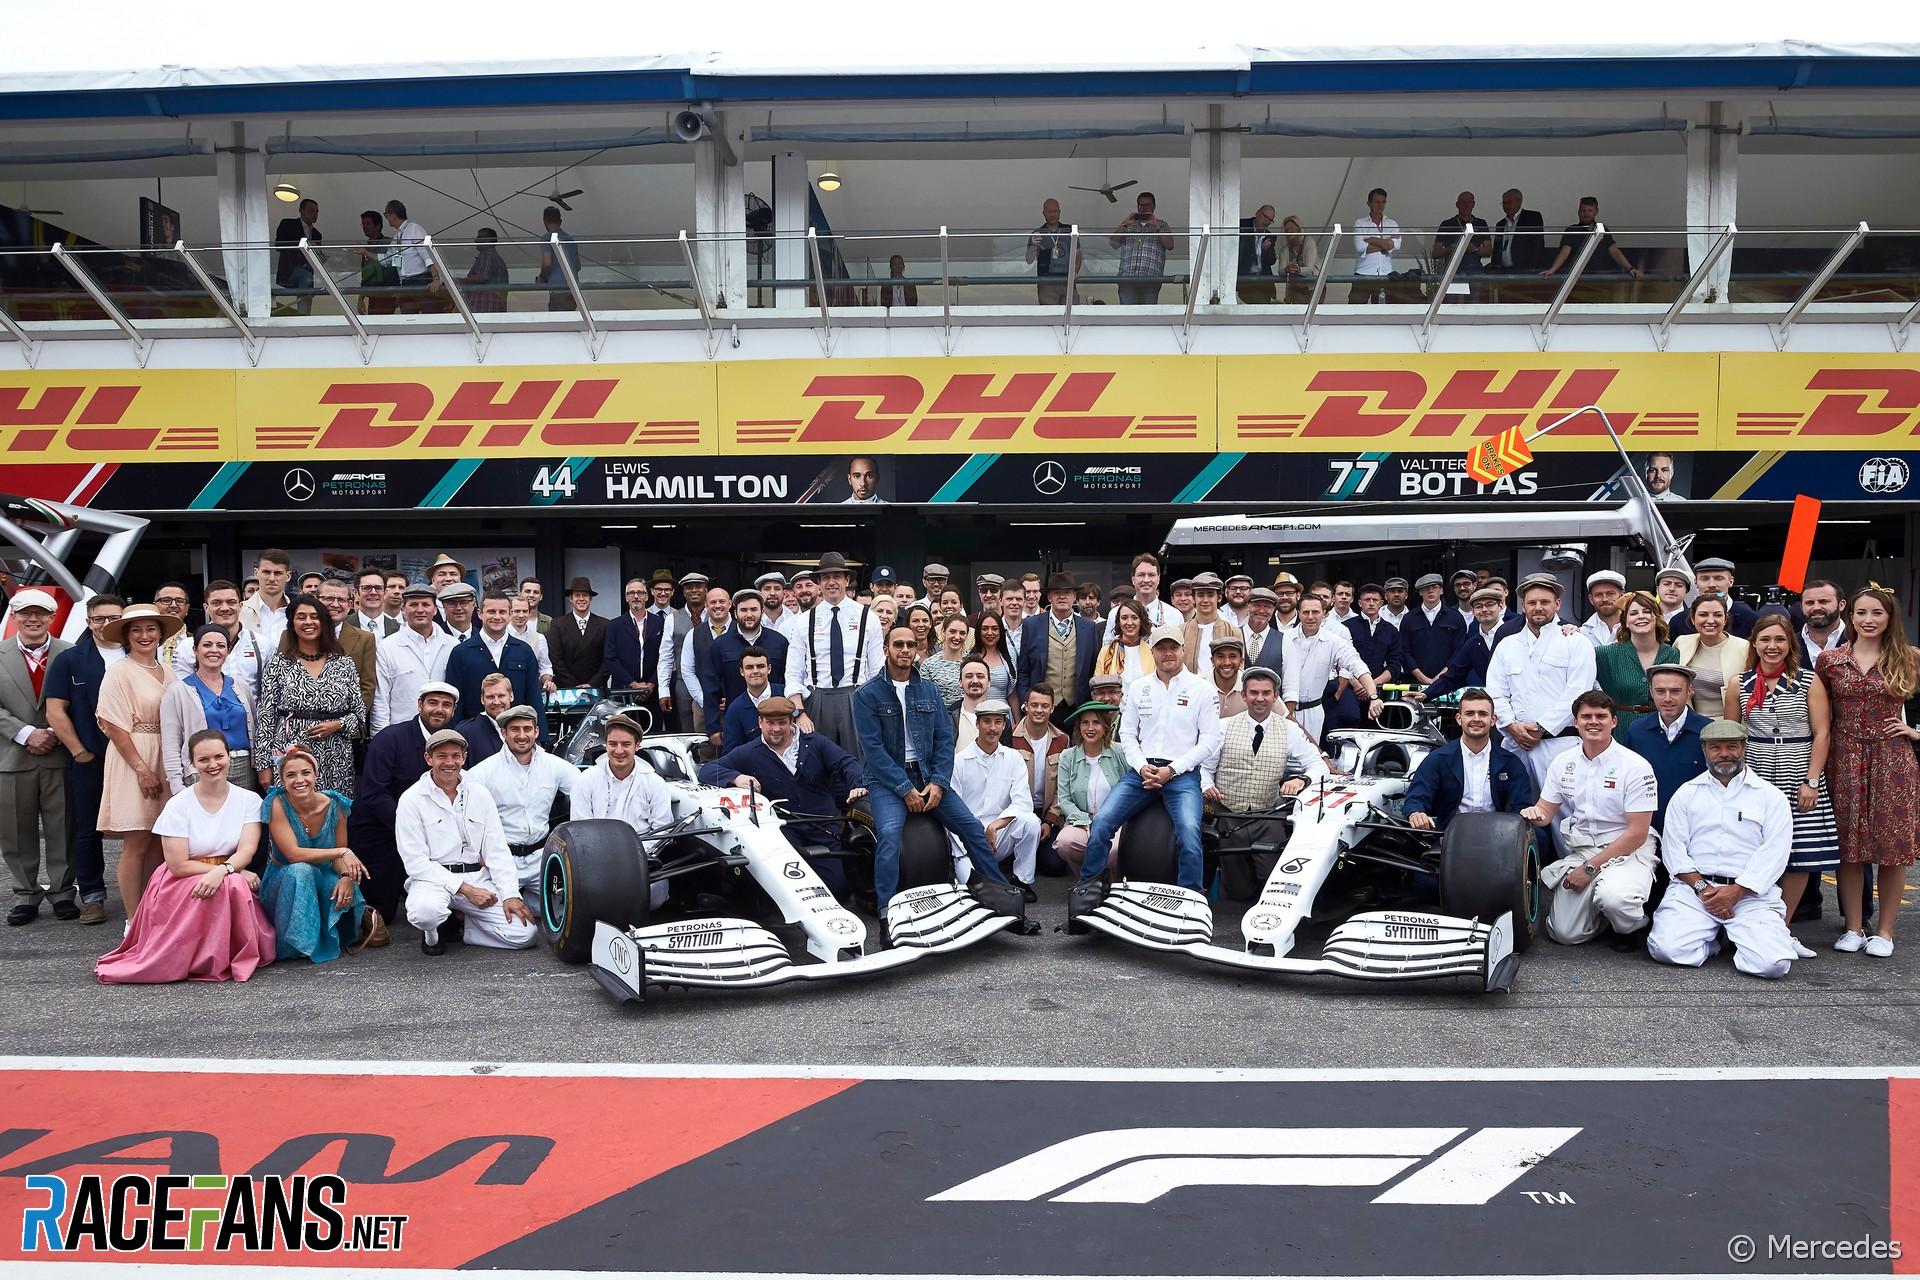 Mercedes, Hockenheimring, 2019